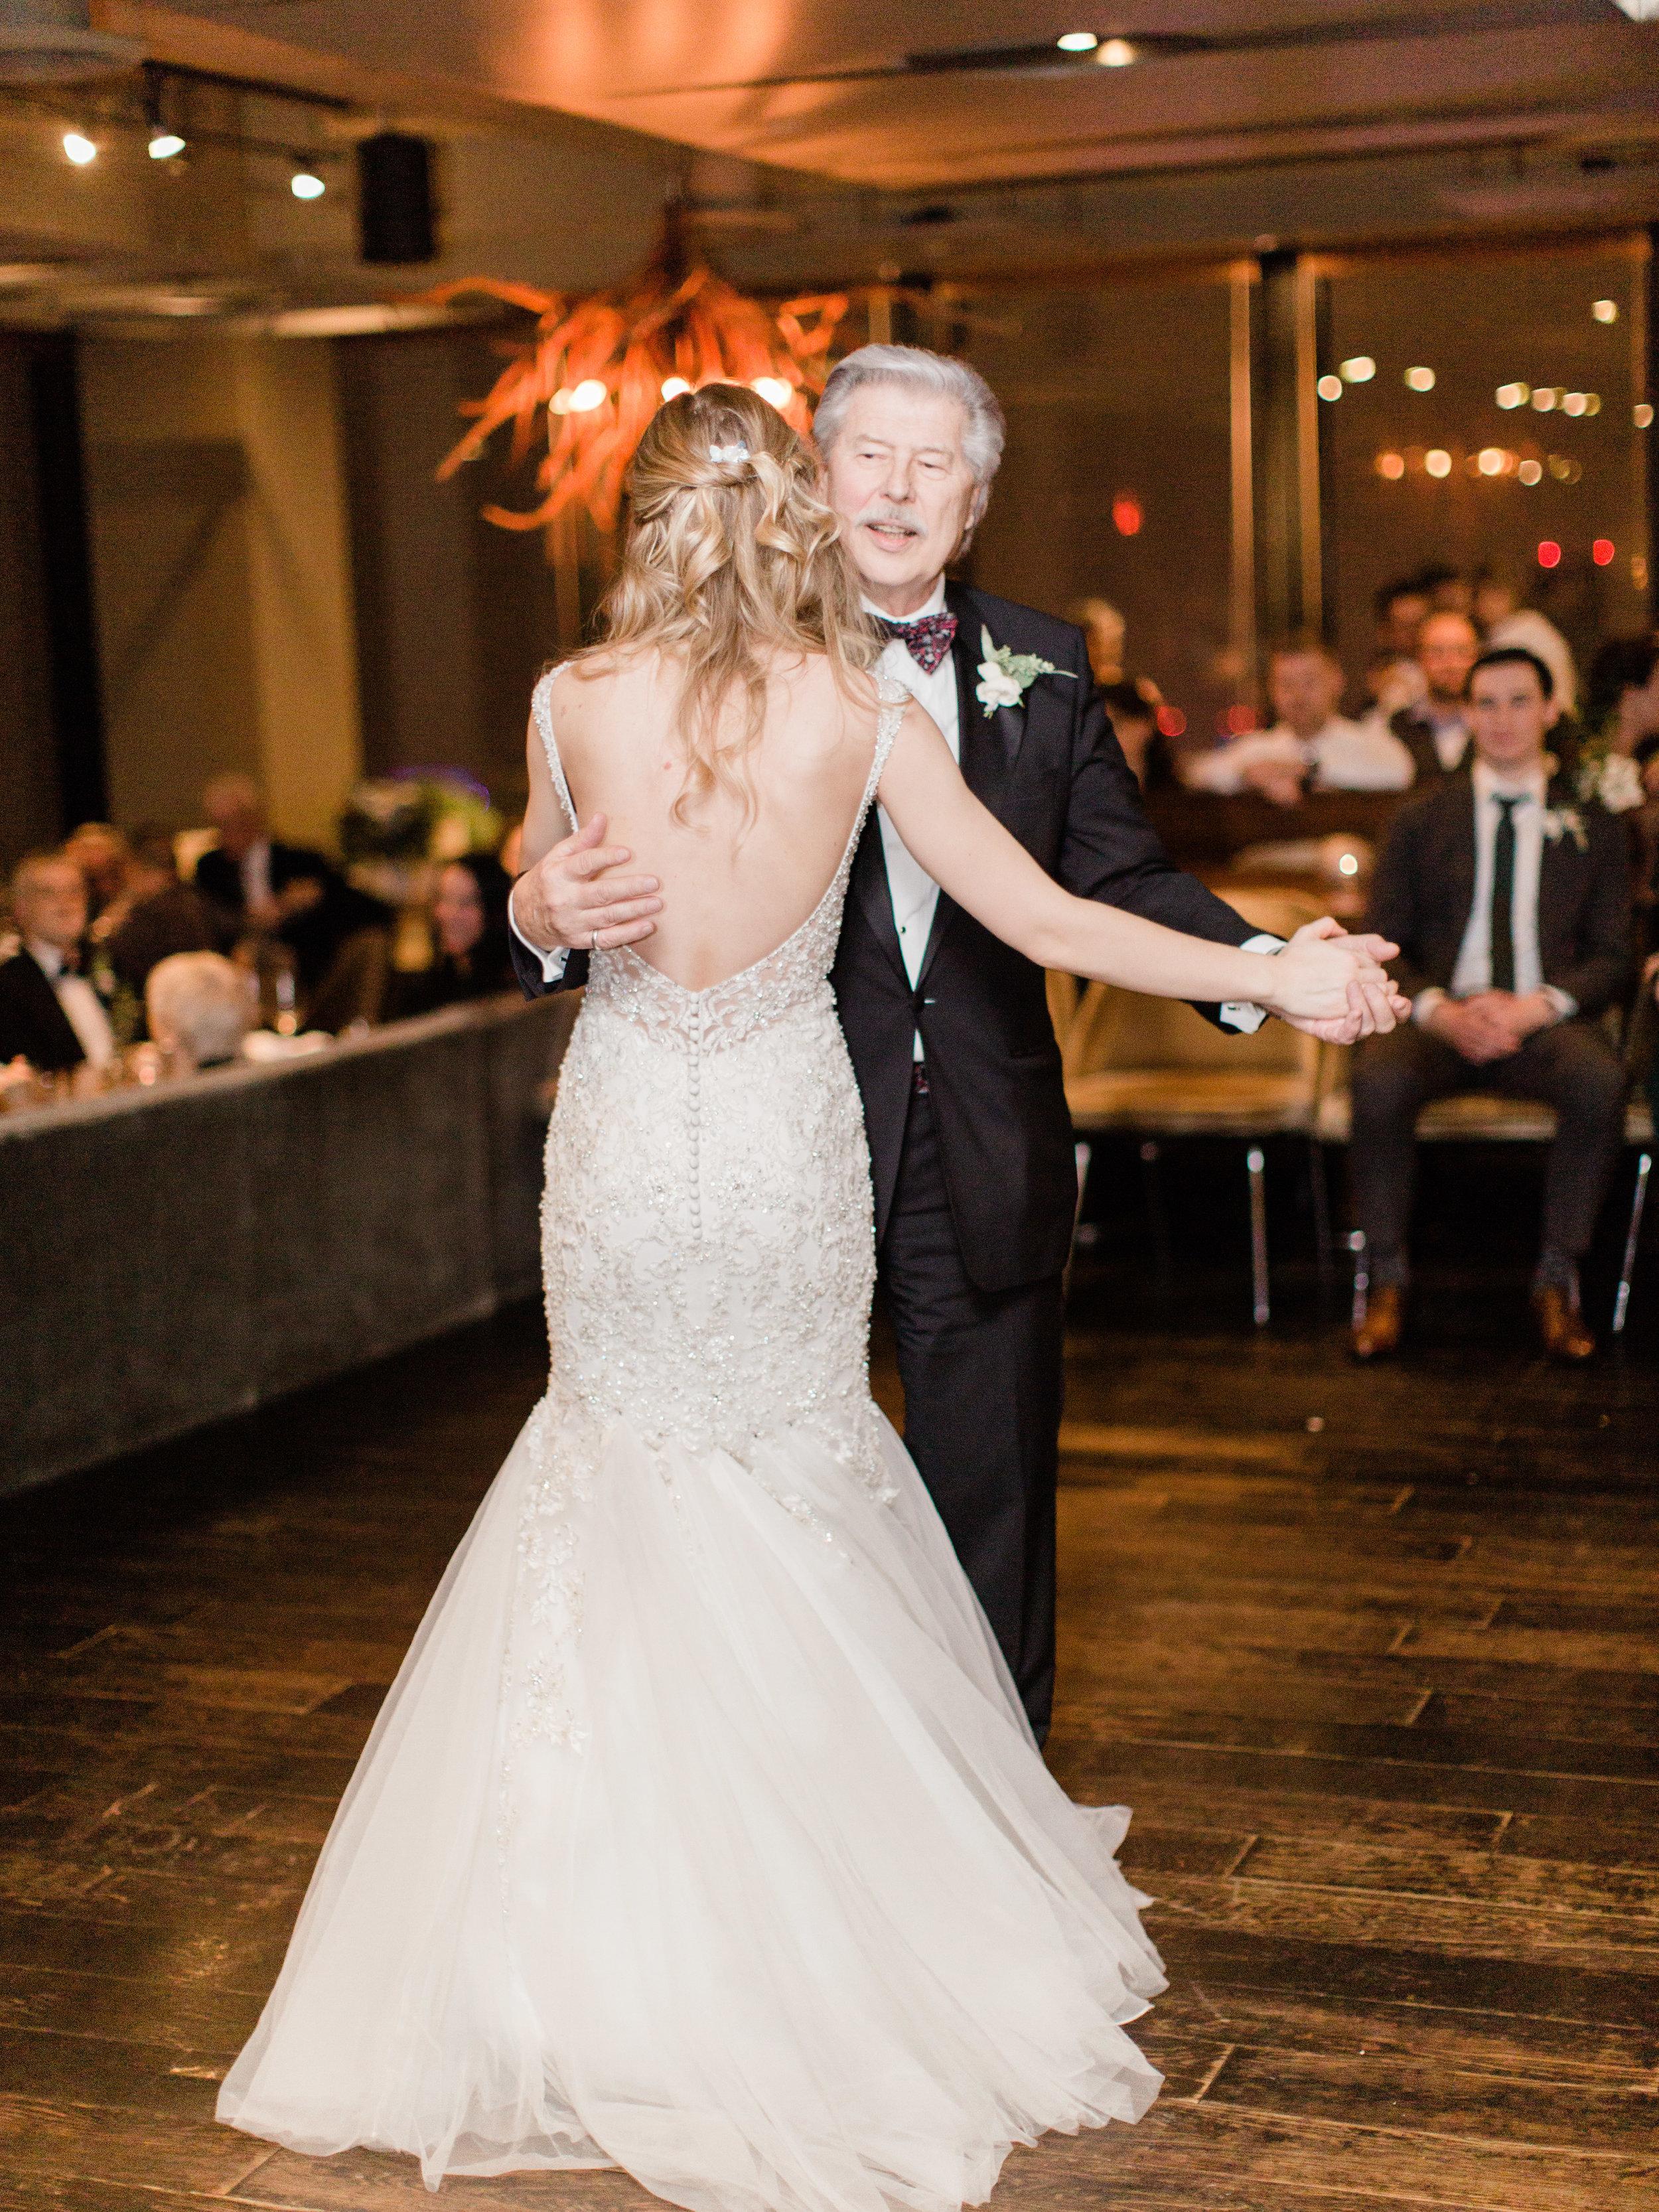 Toronto-wedding-photographer-downtown-winter-wedding-intimate-restaurant-canoe185.jpg